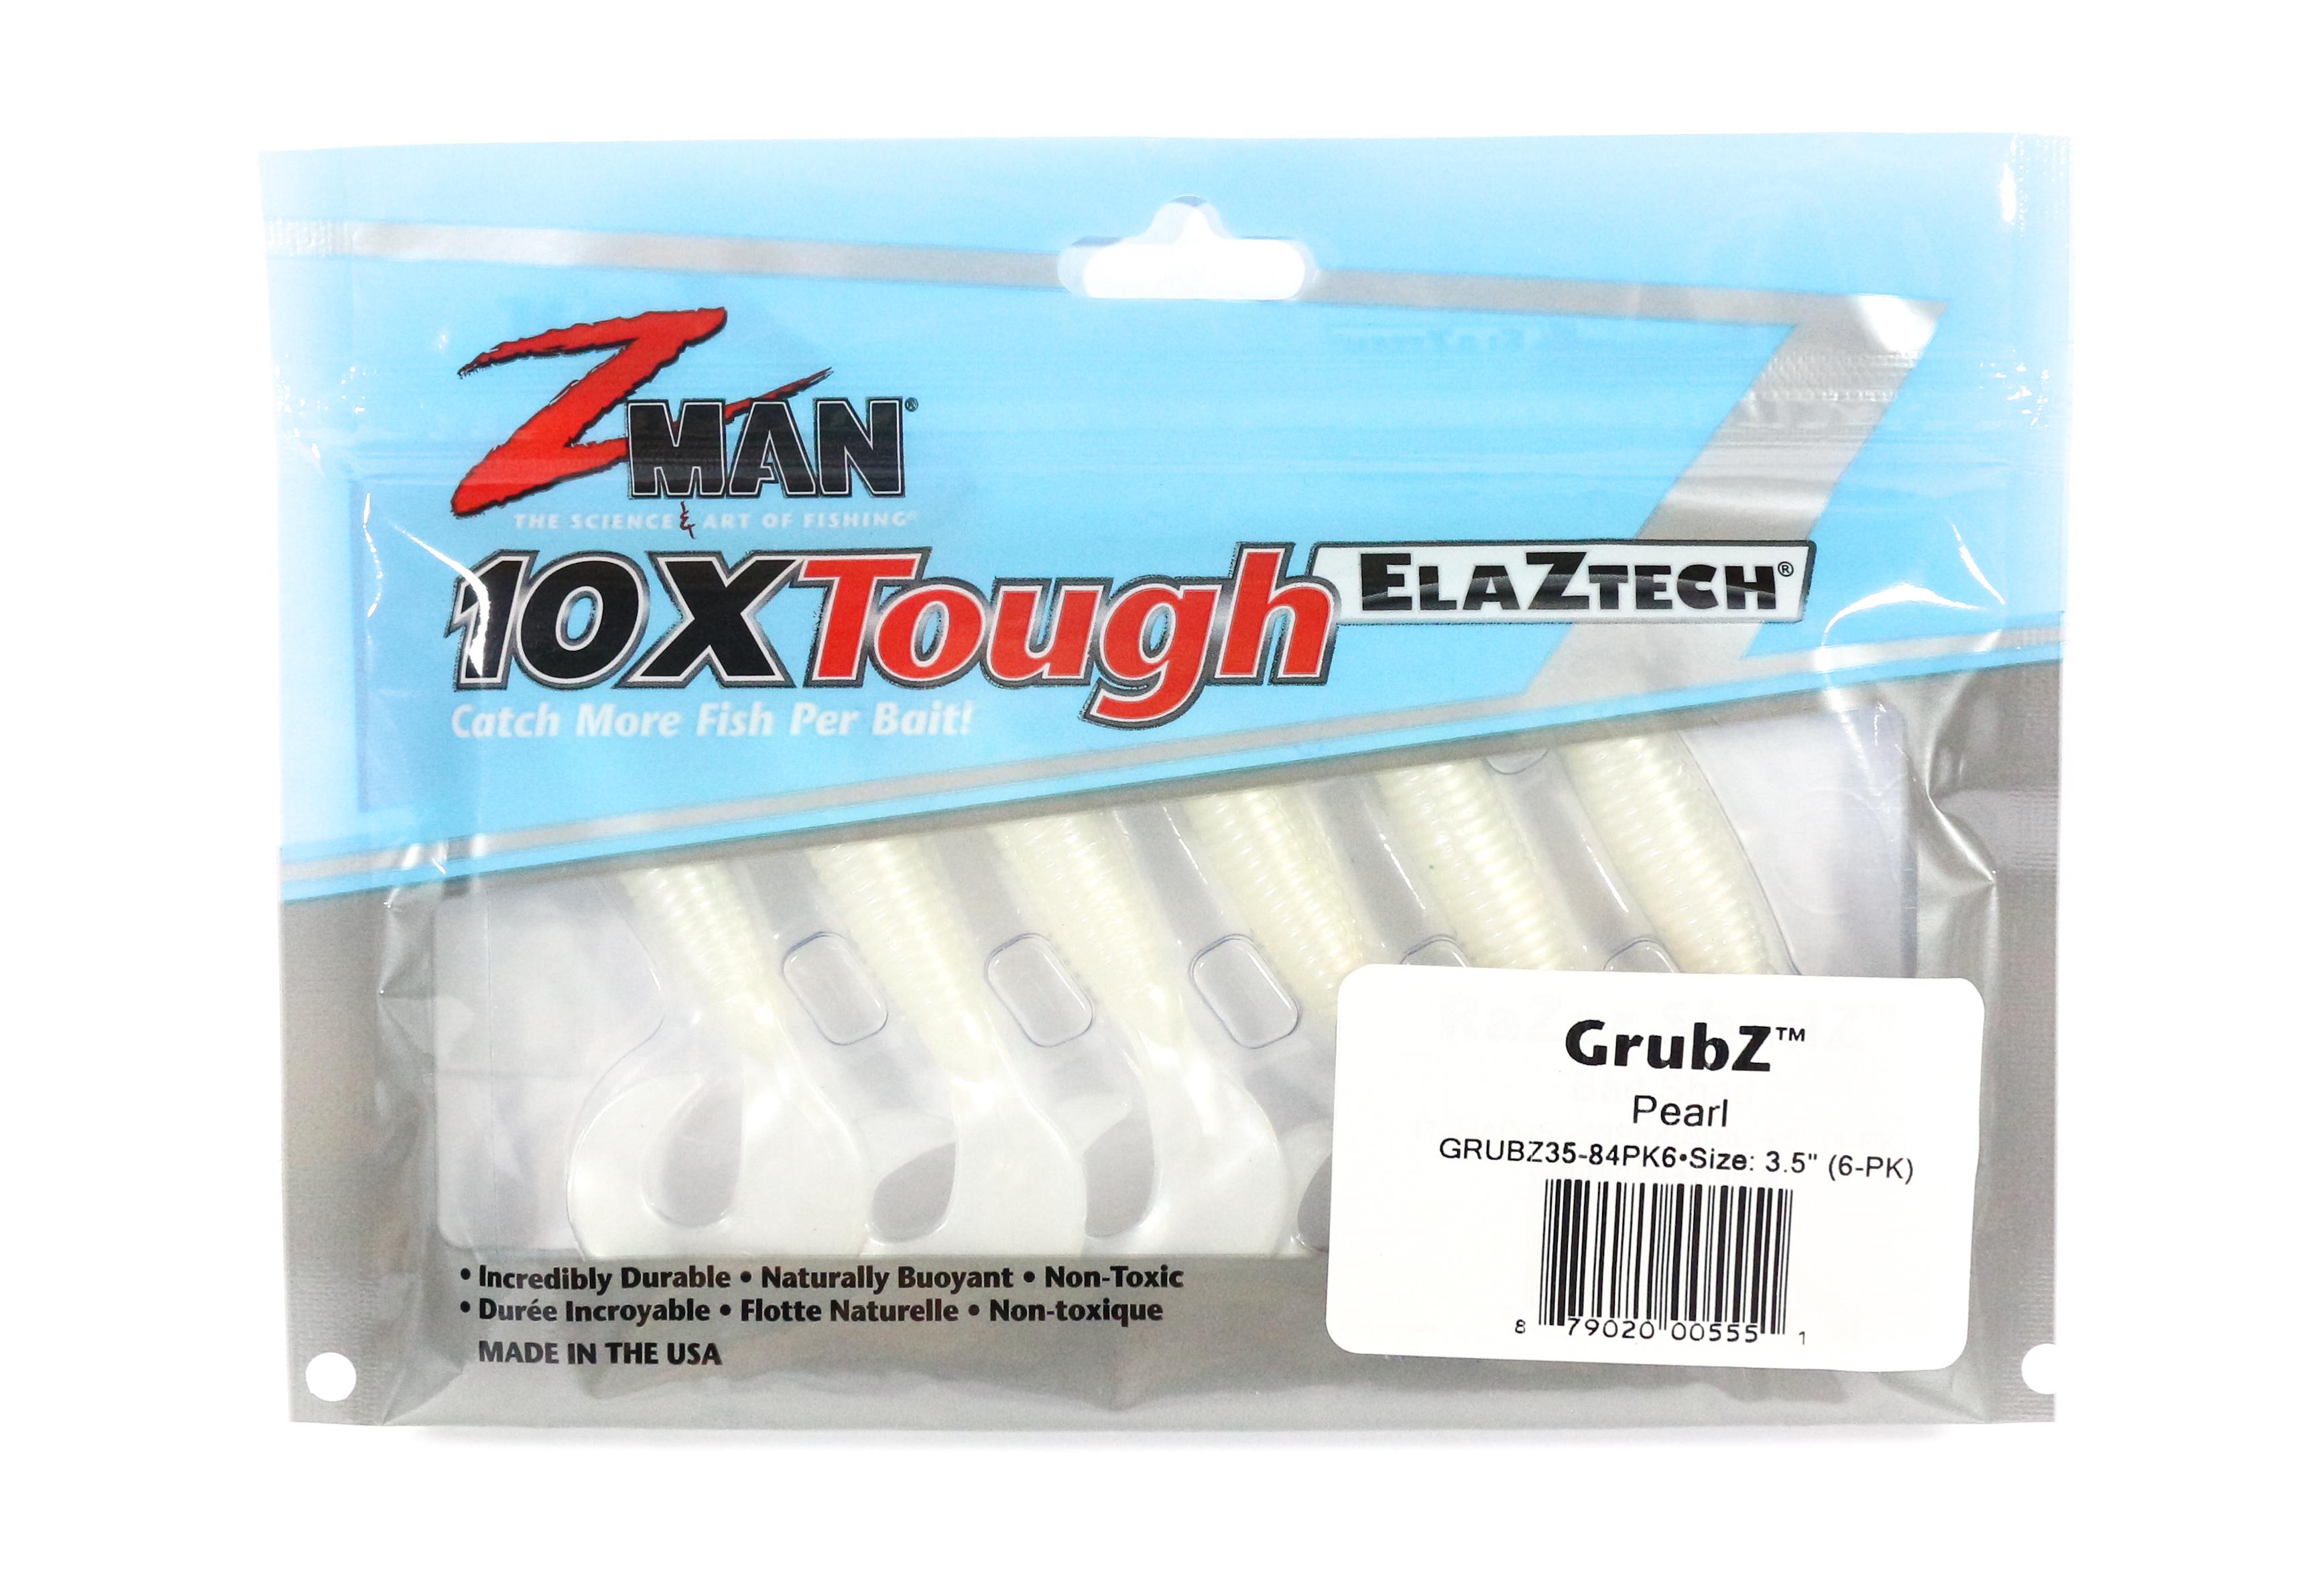 Zman Soft Lure GrubZ 3.5 Inch 6 per pack Pearl (5551)